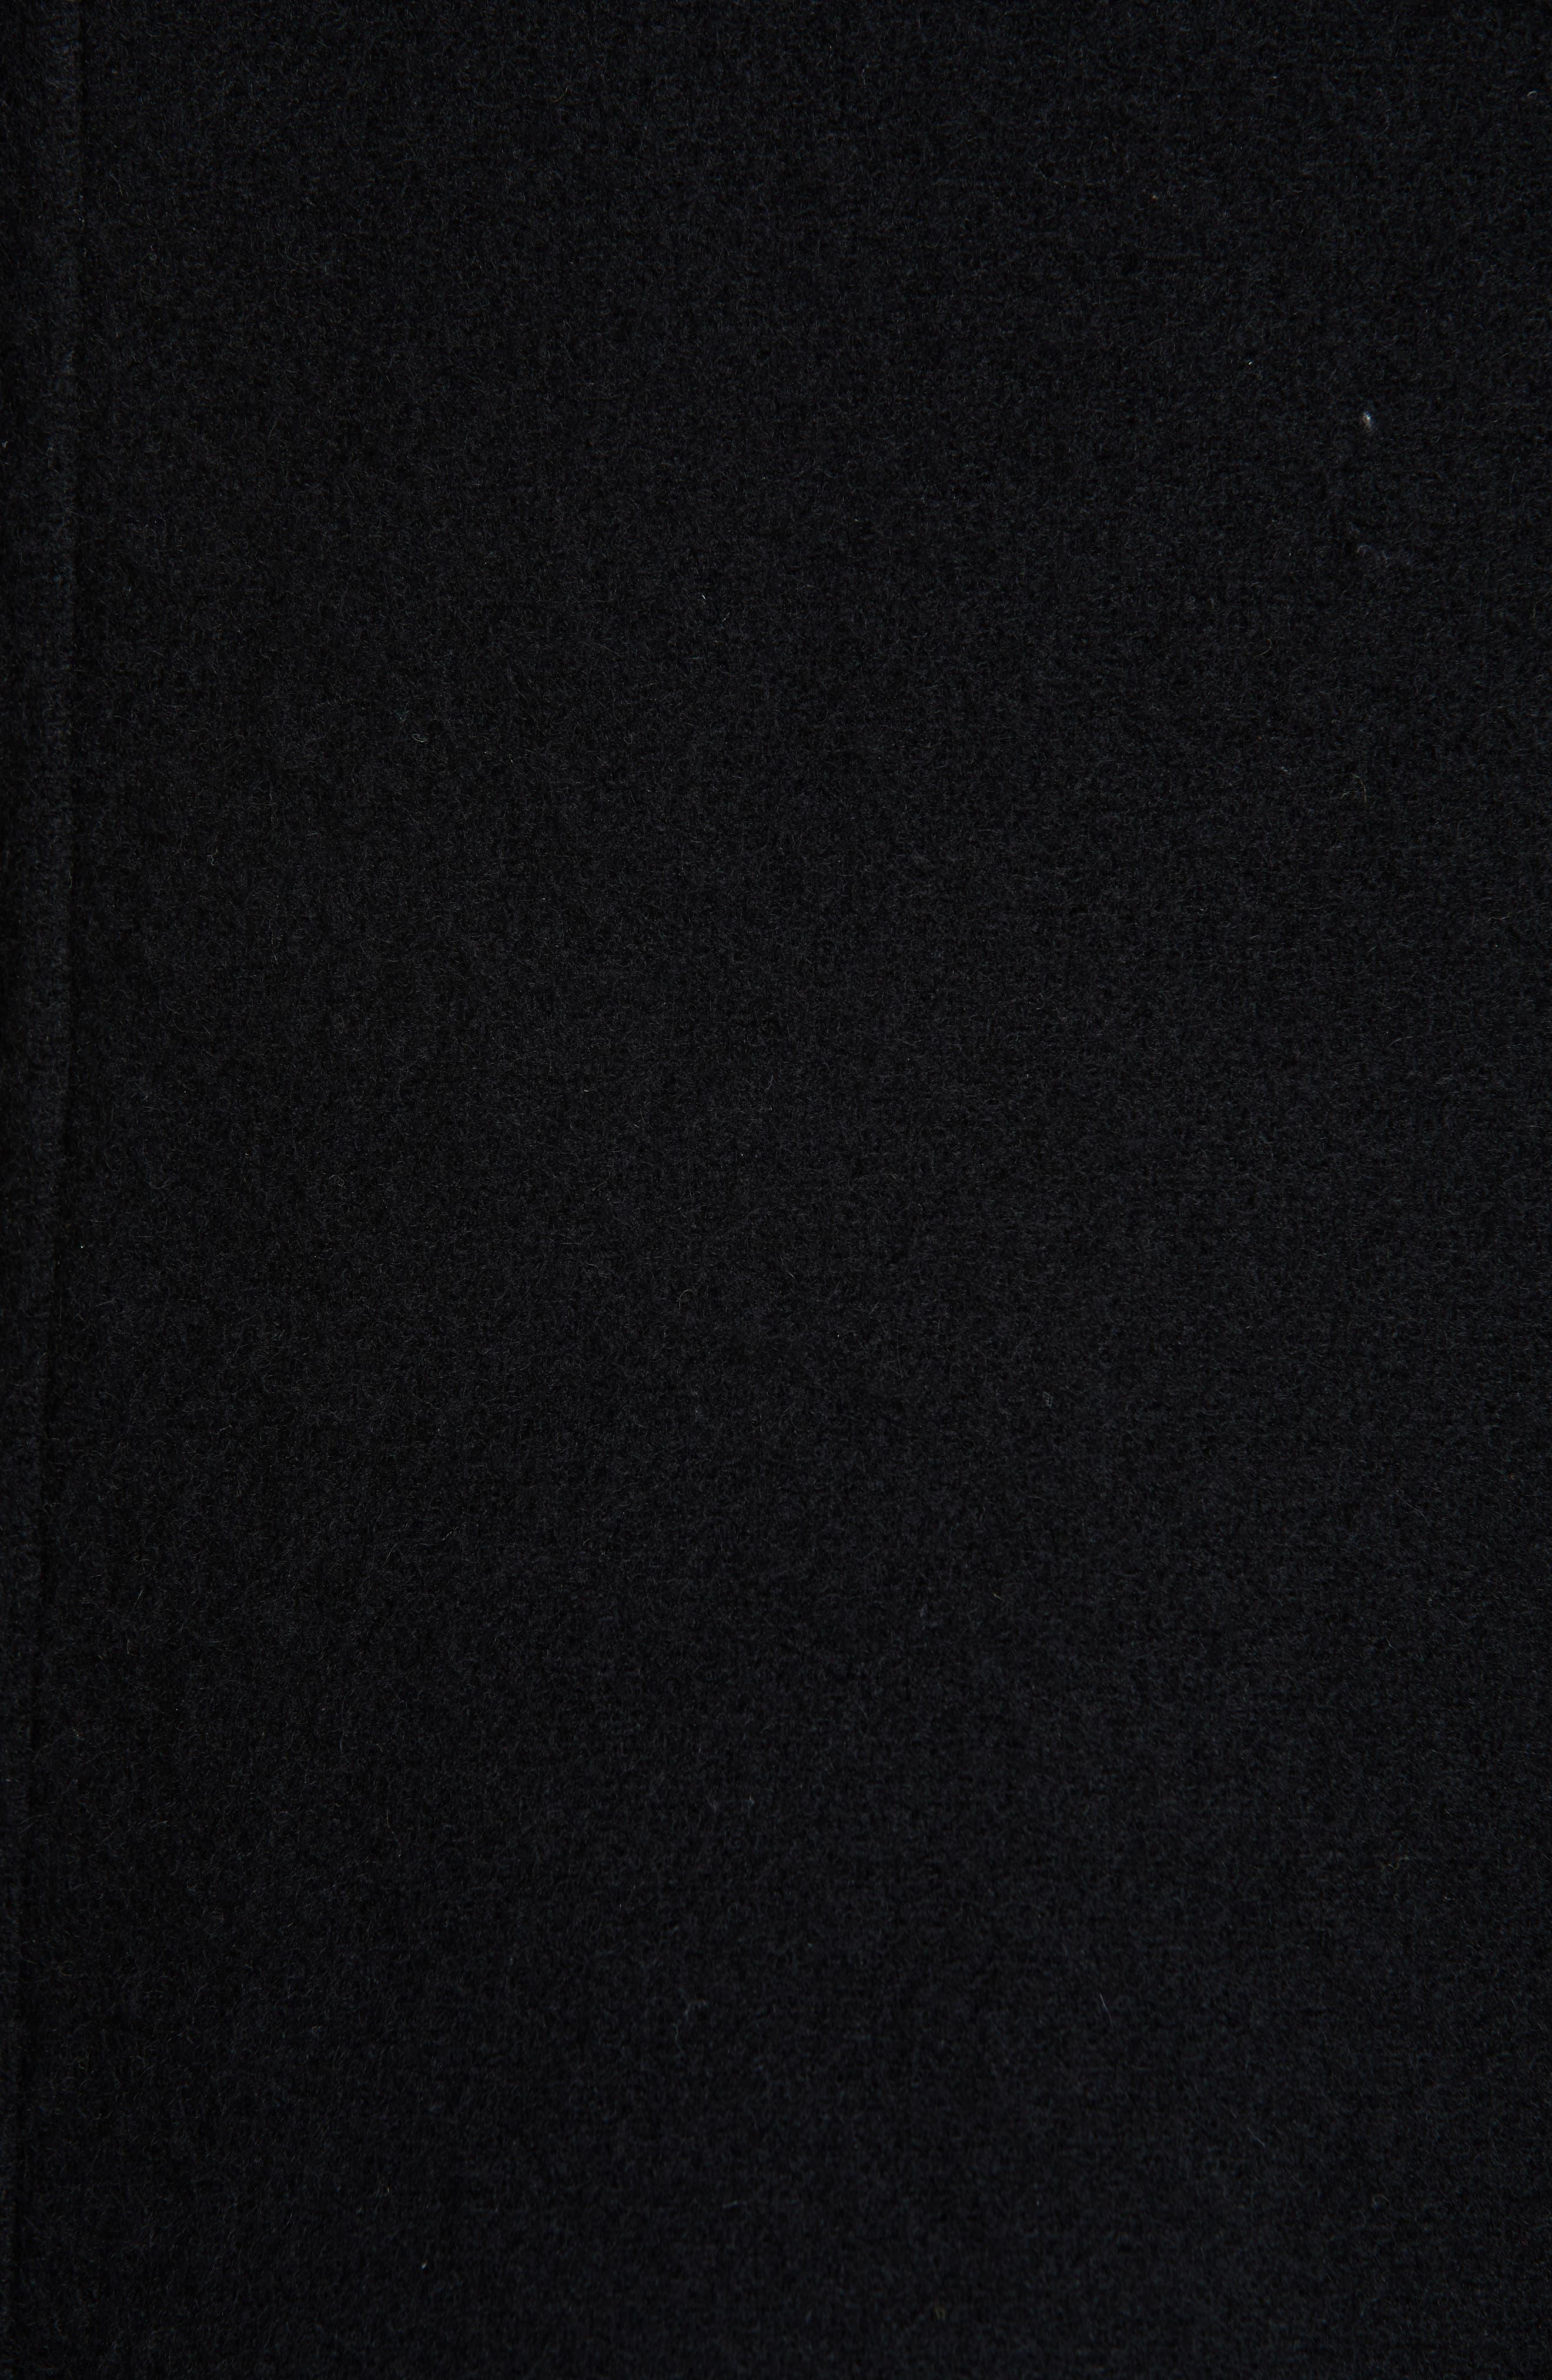 Studded Wool Blend Coat,                             Alternate thumbnail 6, color,                             BLACK